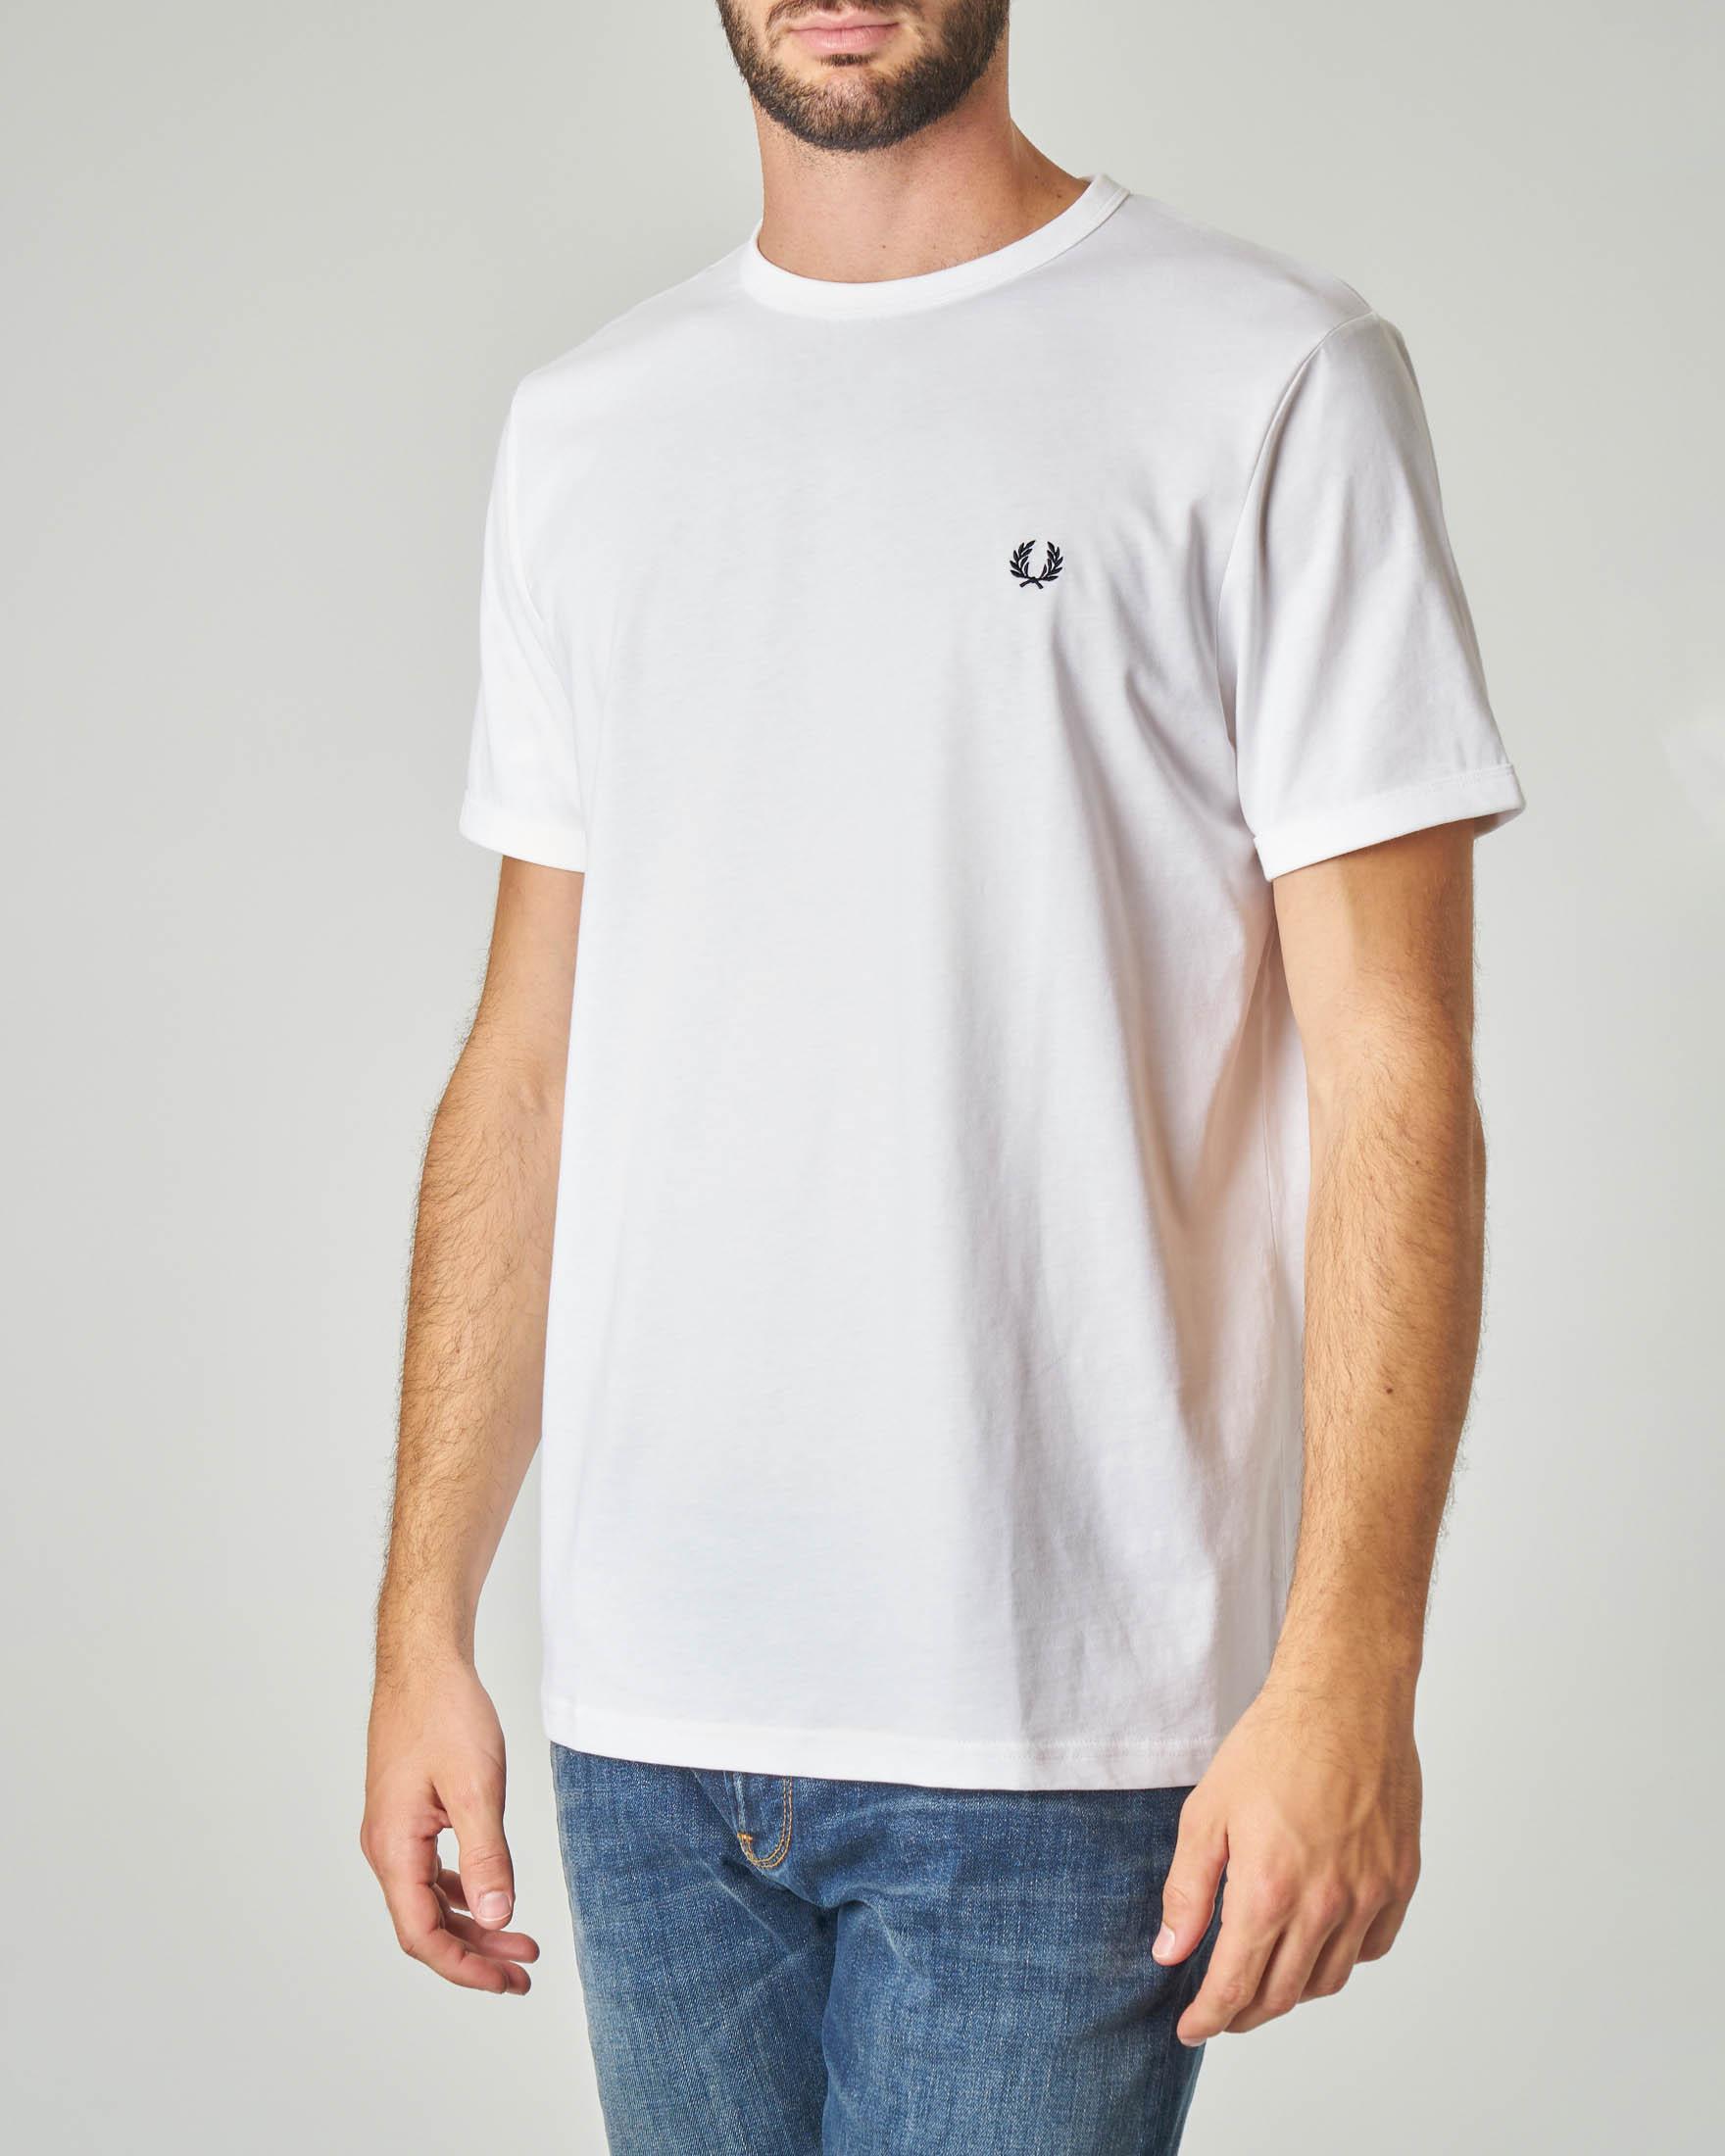 T-shirt bianca con logo piccolo ricamato